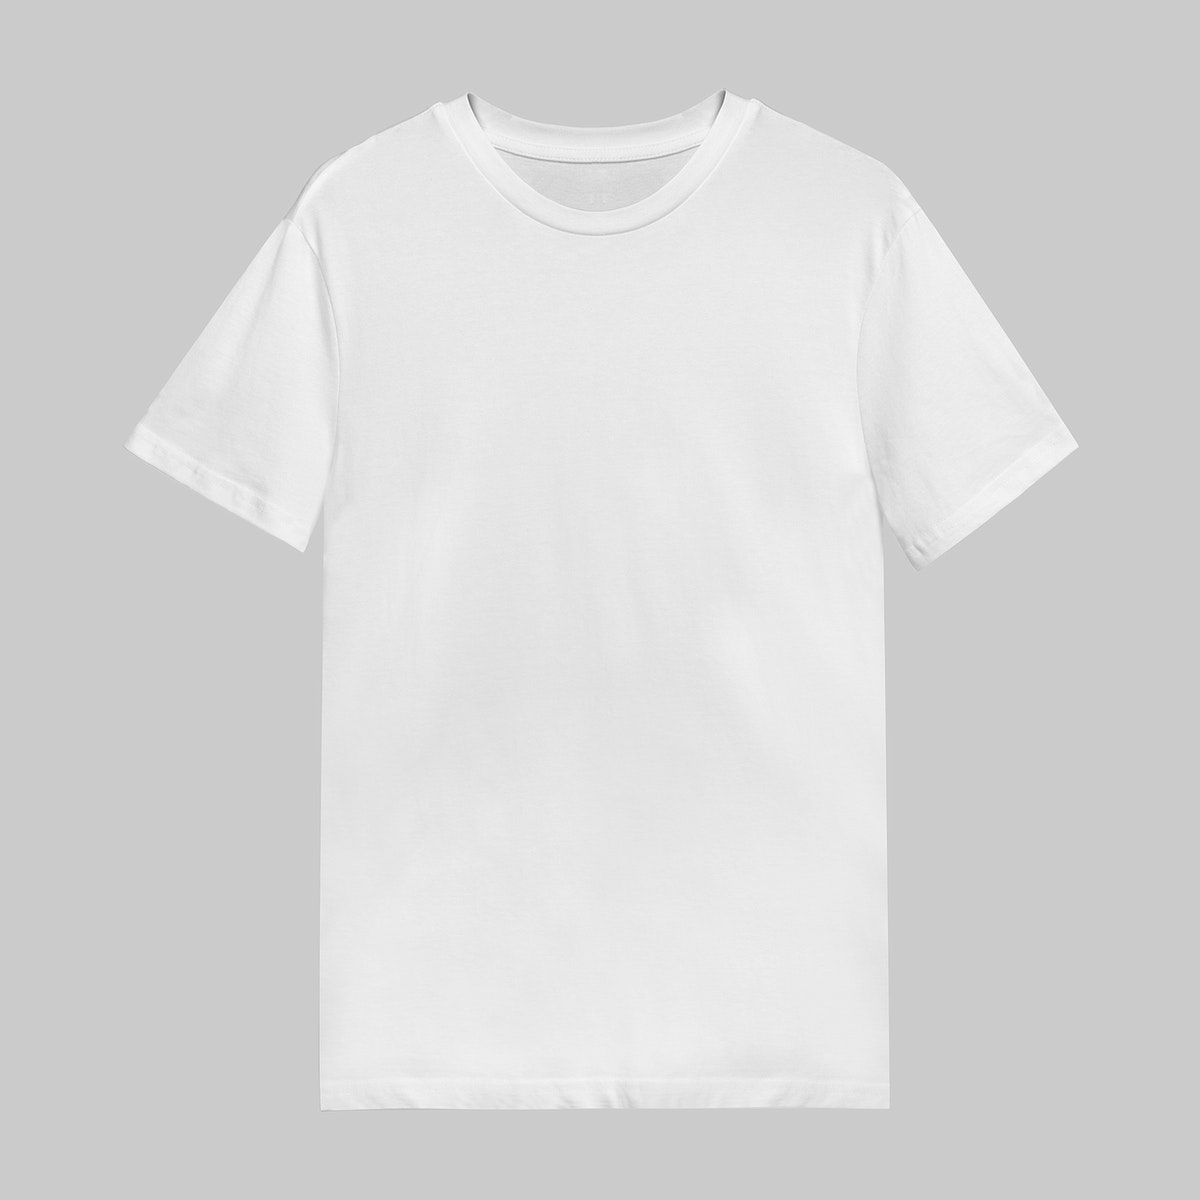 Download Premium Illustration Of White T Shirt Mockup On Gray Background Shirt Mockup Tshirt Mockup Clothing Mockup